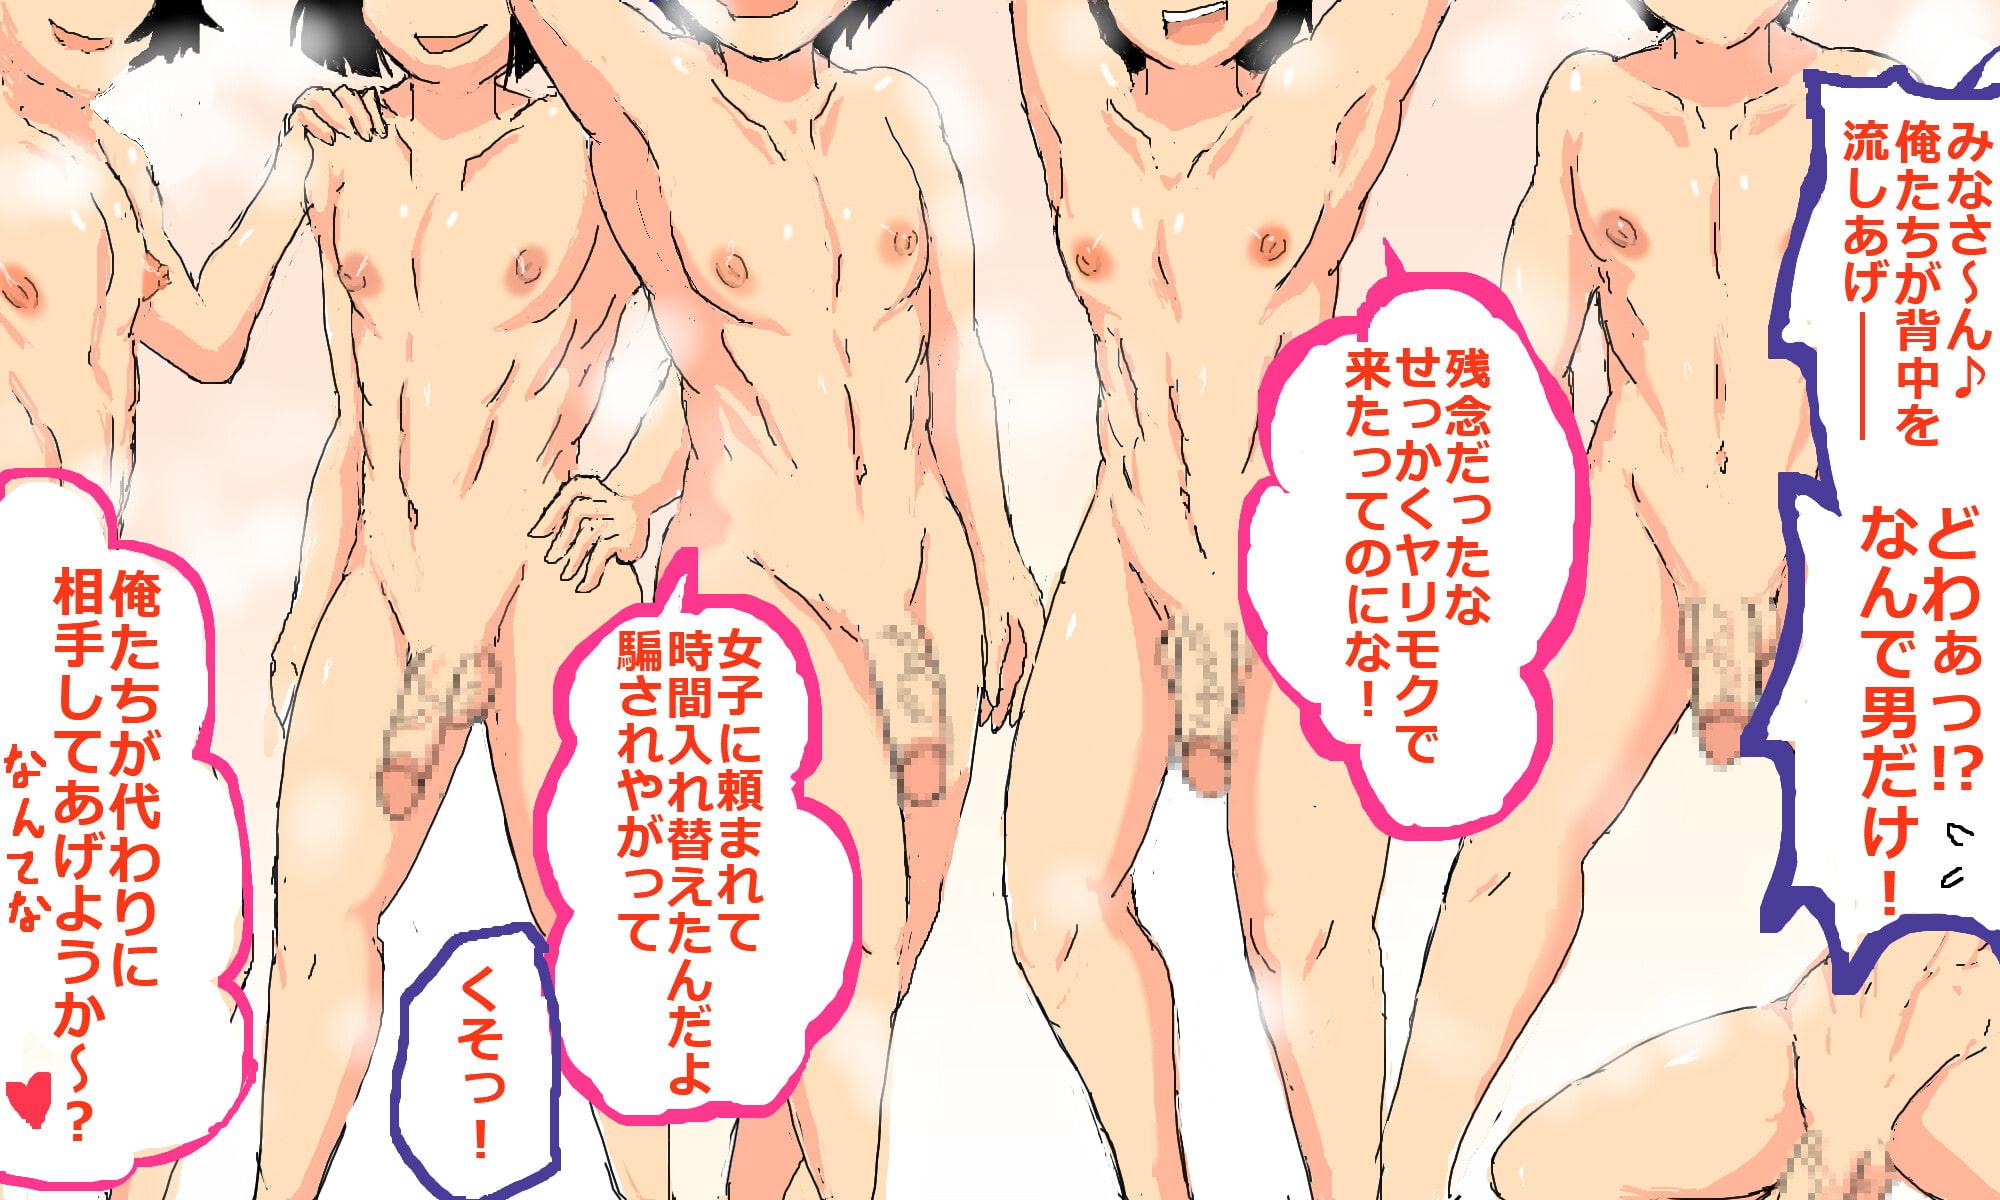 男子種付け入浴時間